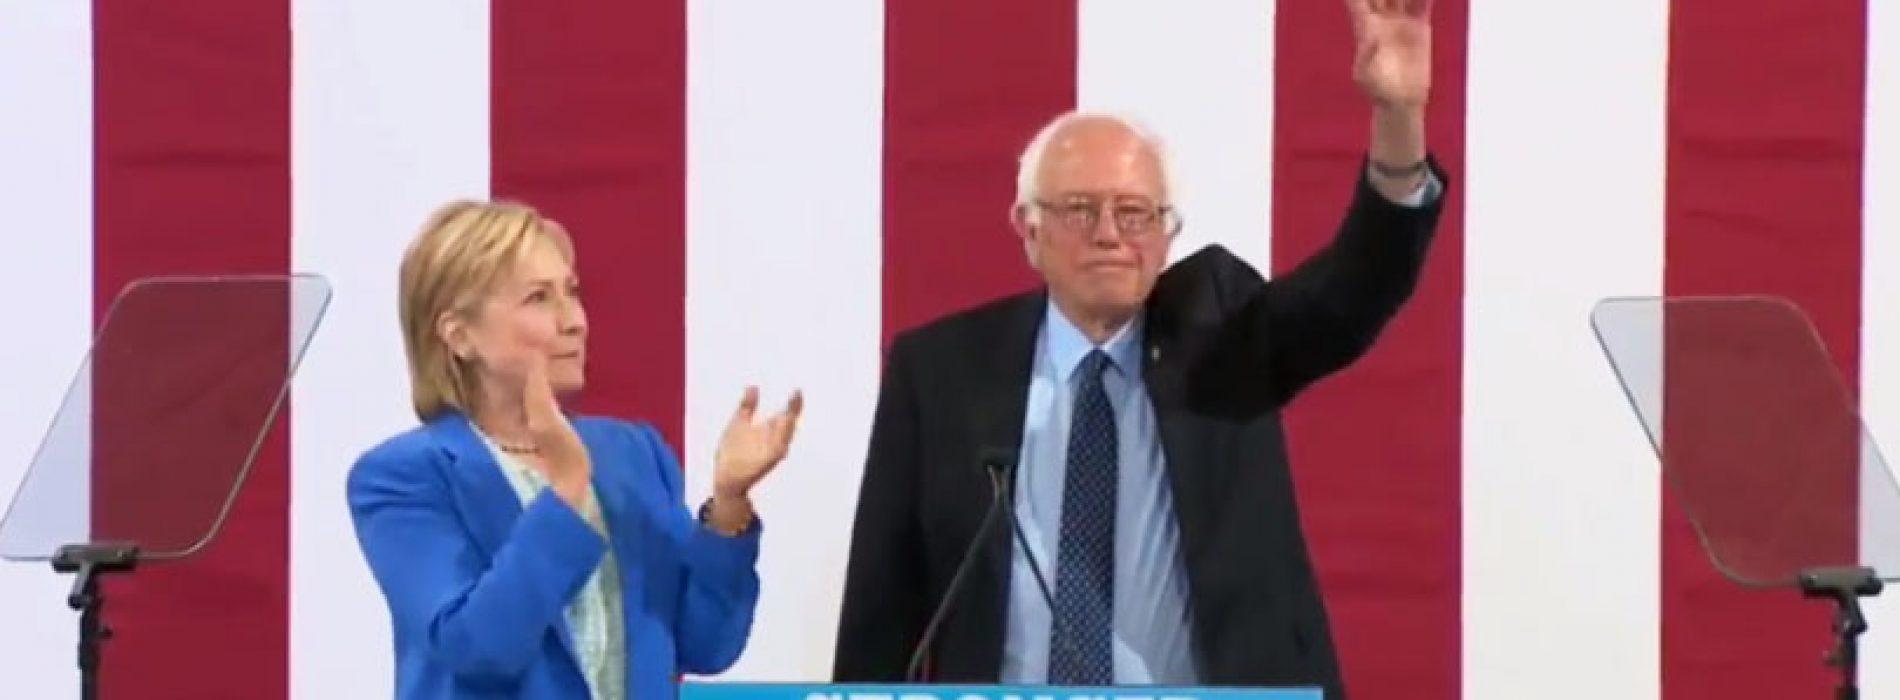 Bernie Sanders endorses Hillary Clinton in Portsmouth, blasts Trump on minimum wage